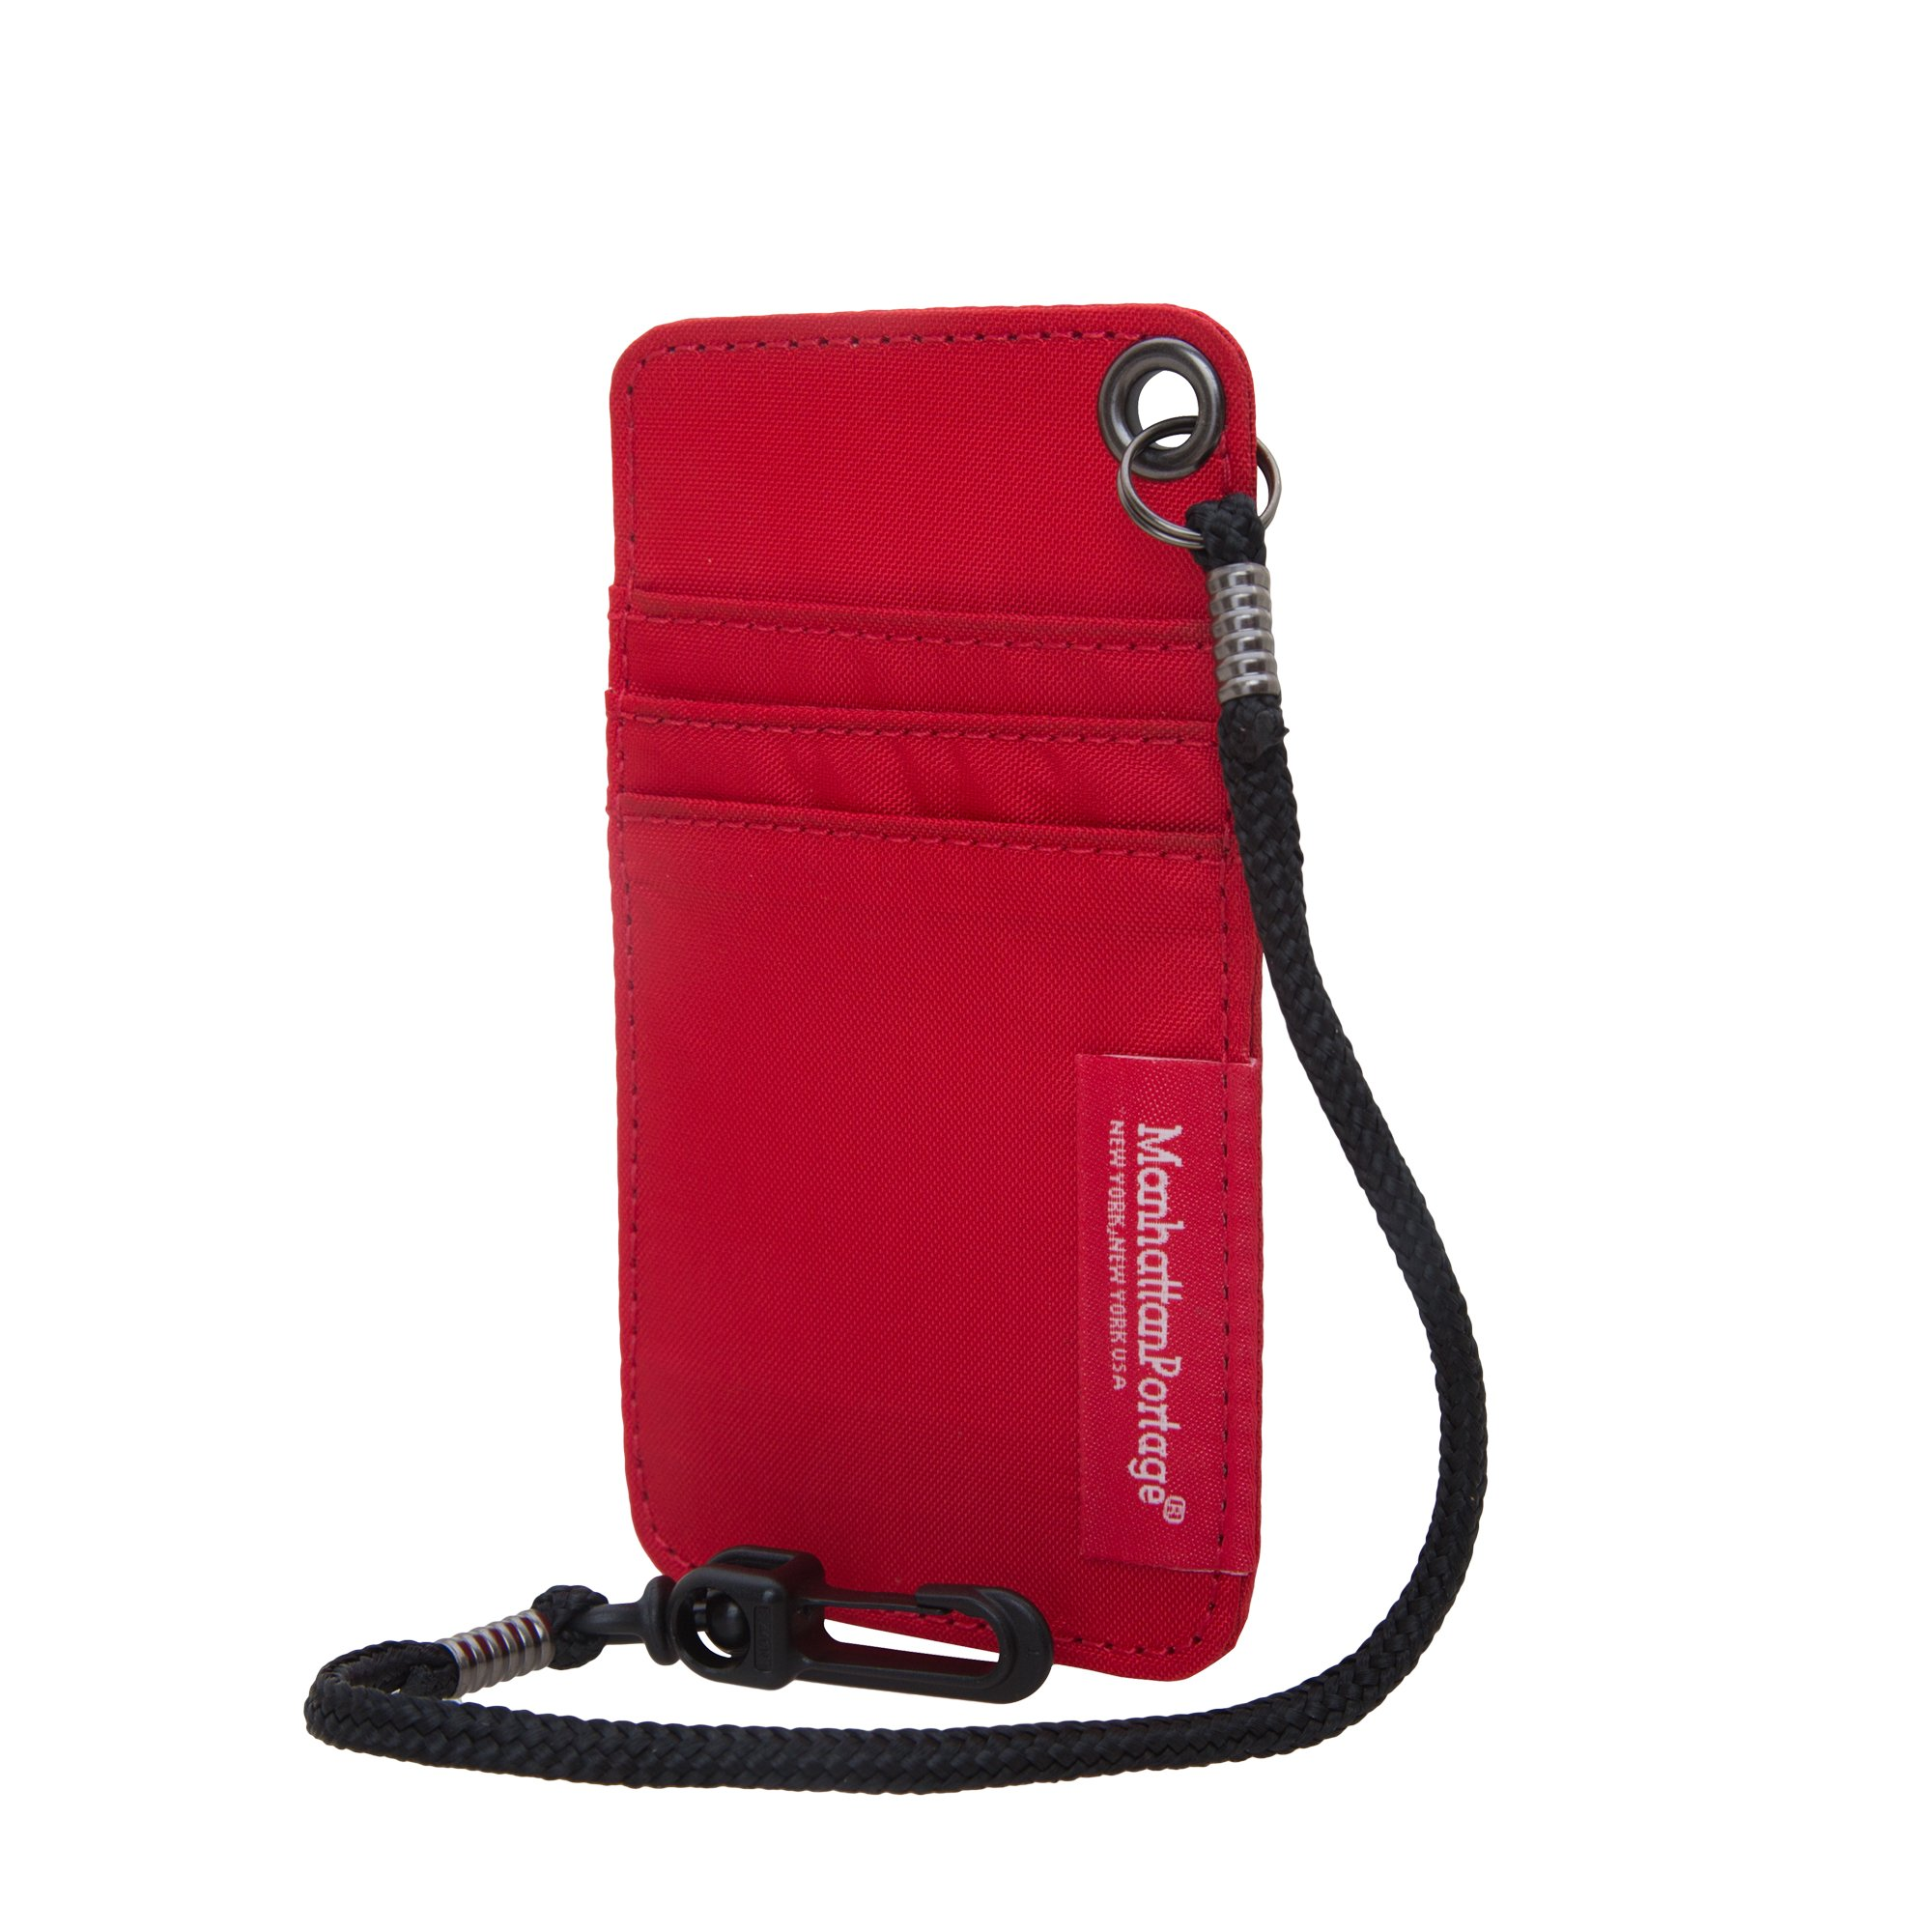 Manhattan Portage City Tech Id Case, Red, One Size